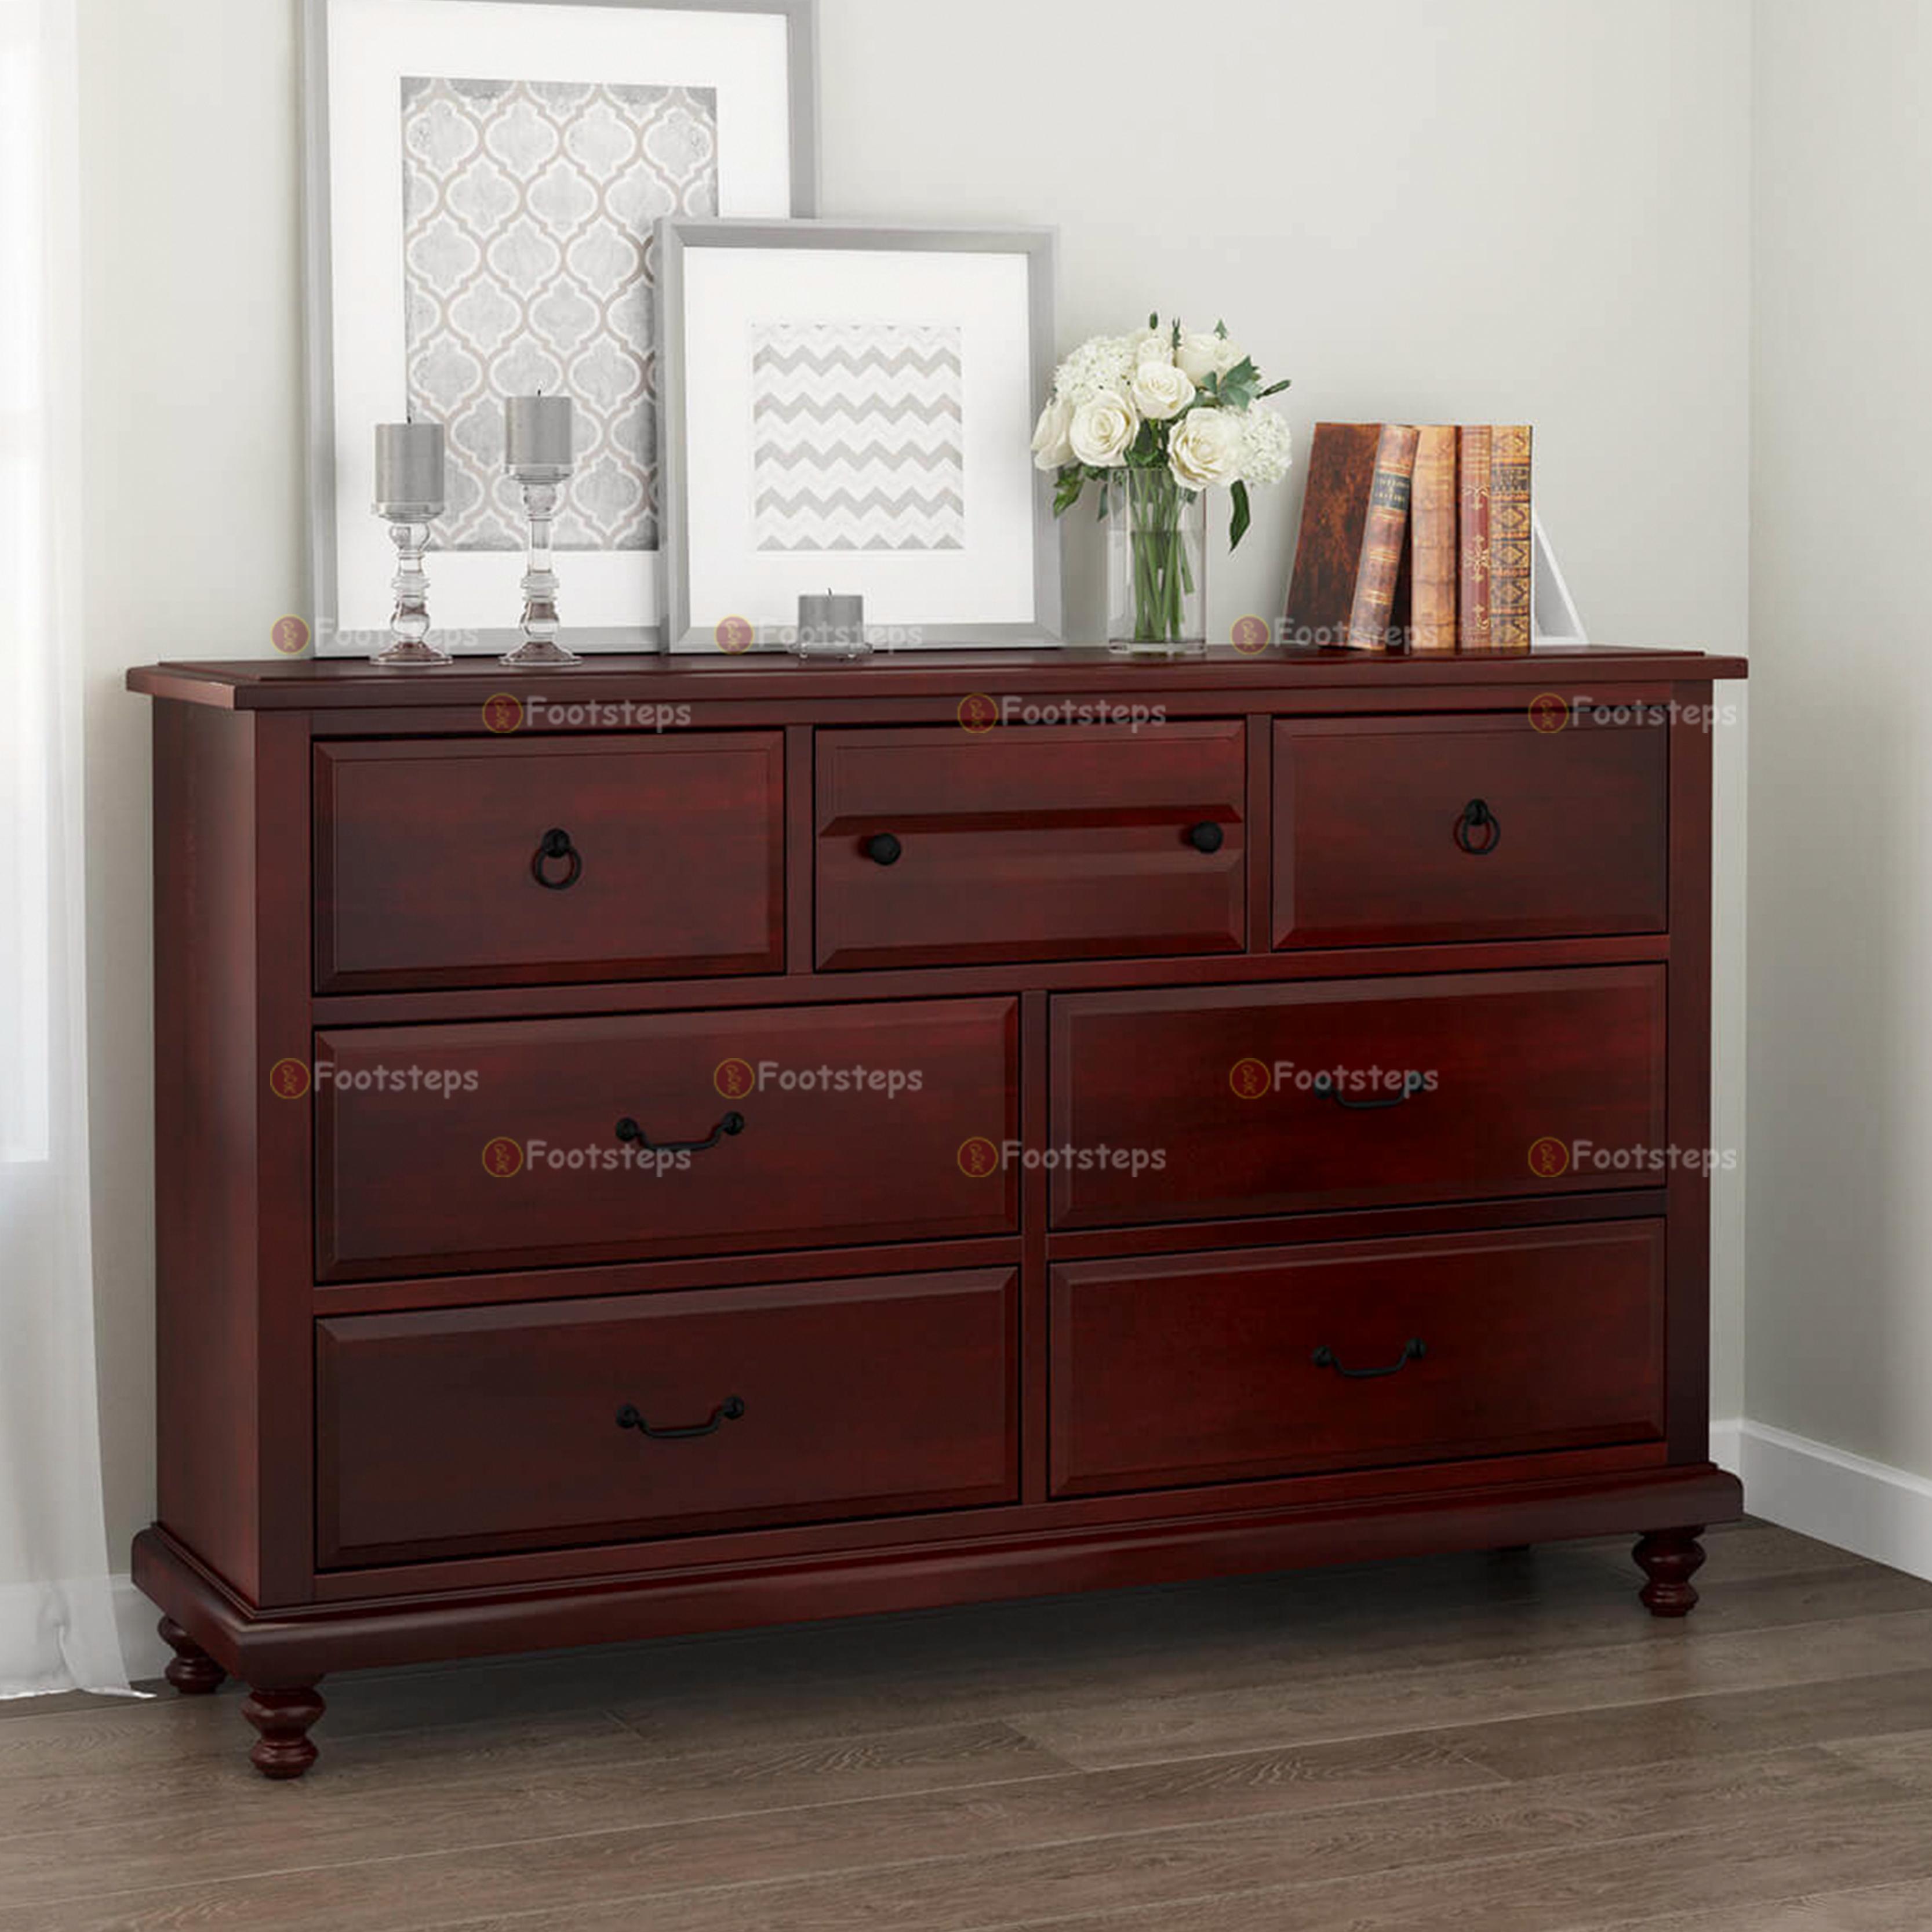 Iowa Traditional Style Mahogany Wood 7 Drawer Dresser 1